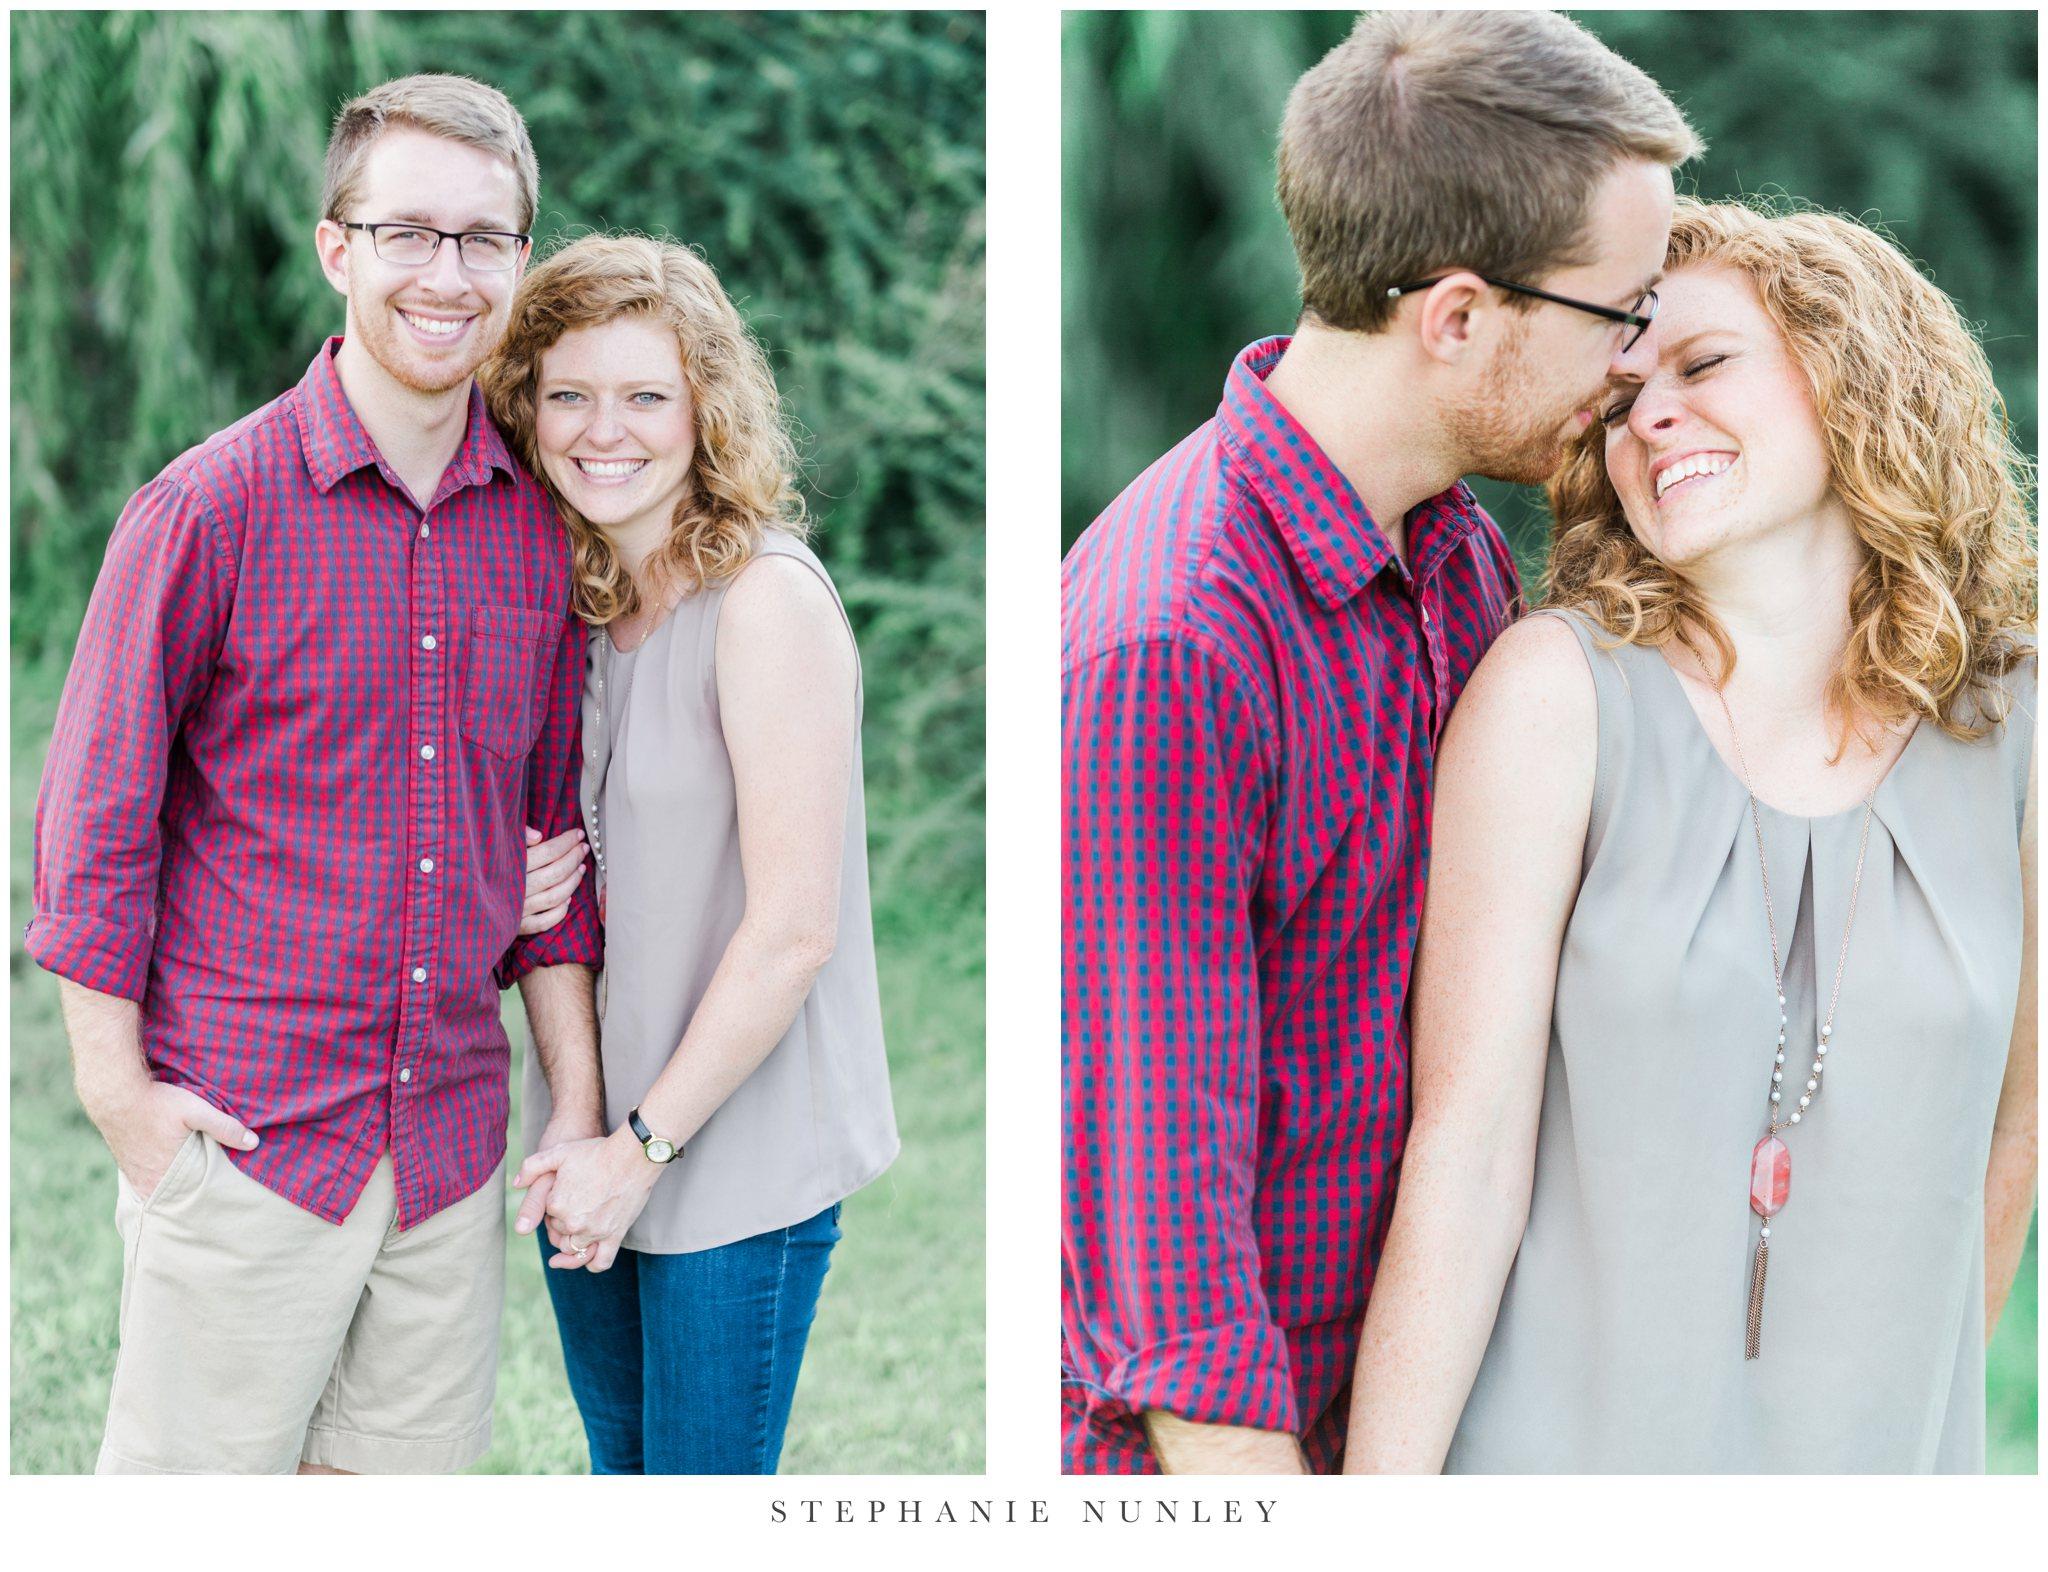 bentonville-arkansas-classic-engagement-photos-0025.jpg